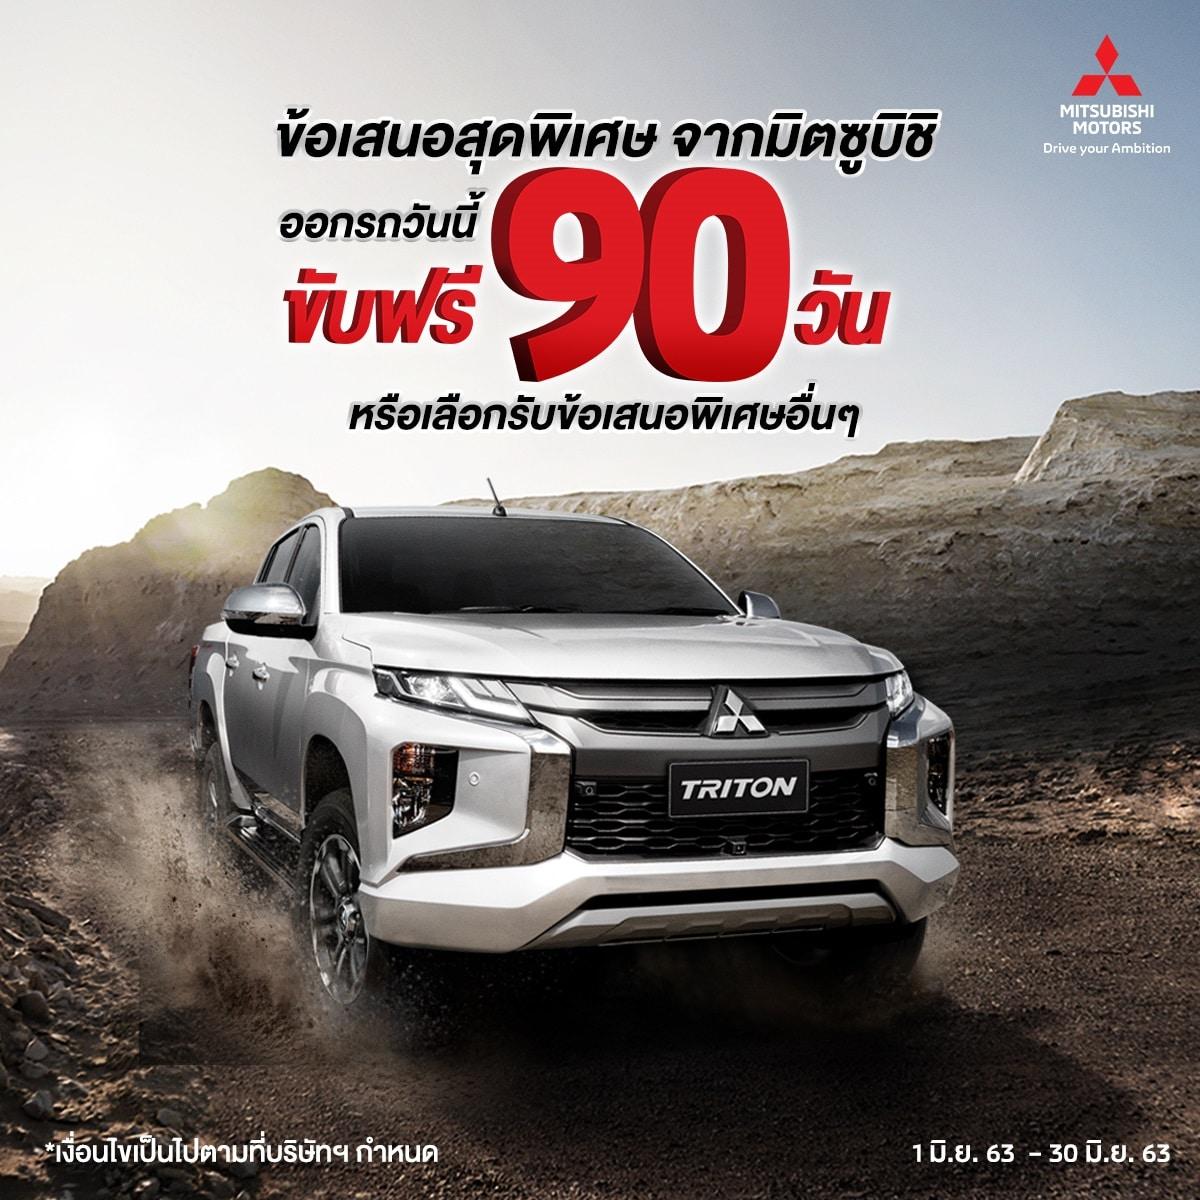 Triton Free Drive 90 days